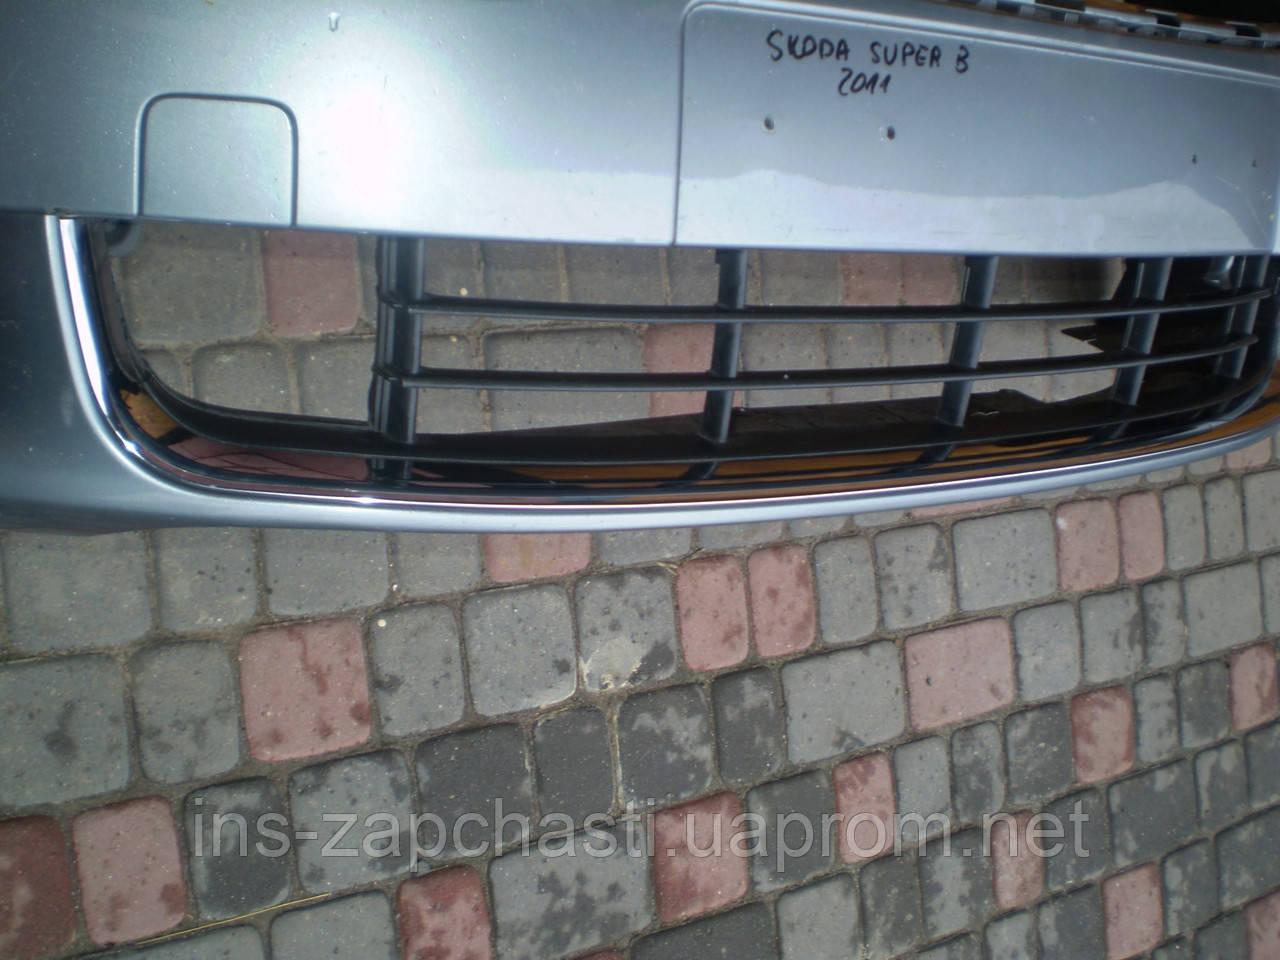 Решетка нижняя на бампер (Решетка переднего бампера) (без хрому) Skoda Superb 2011